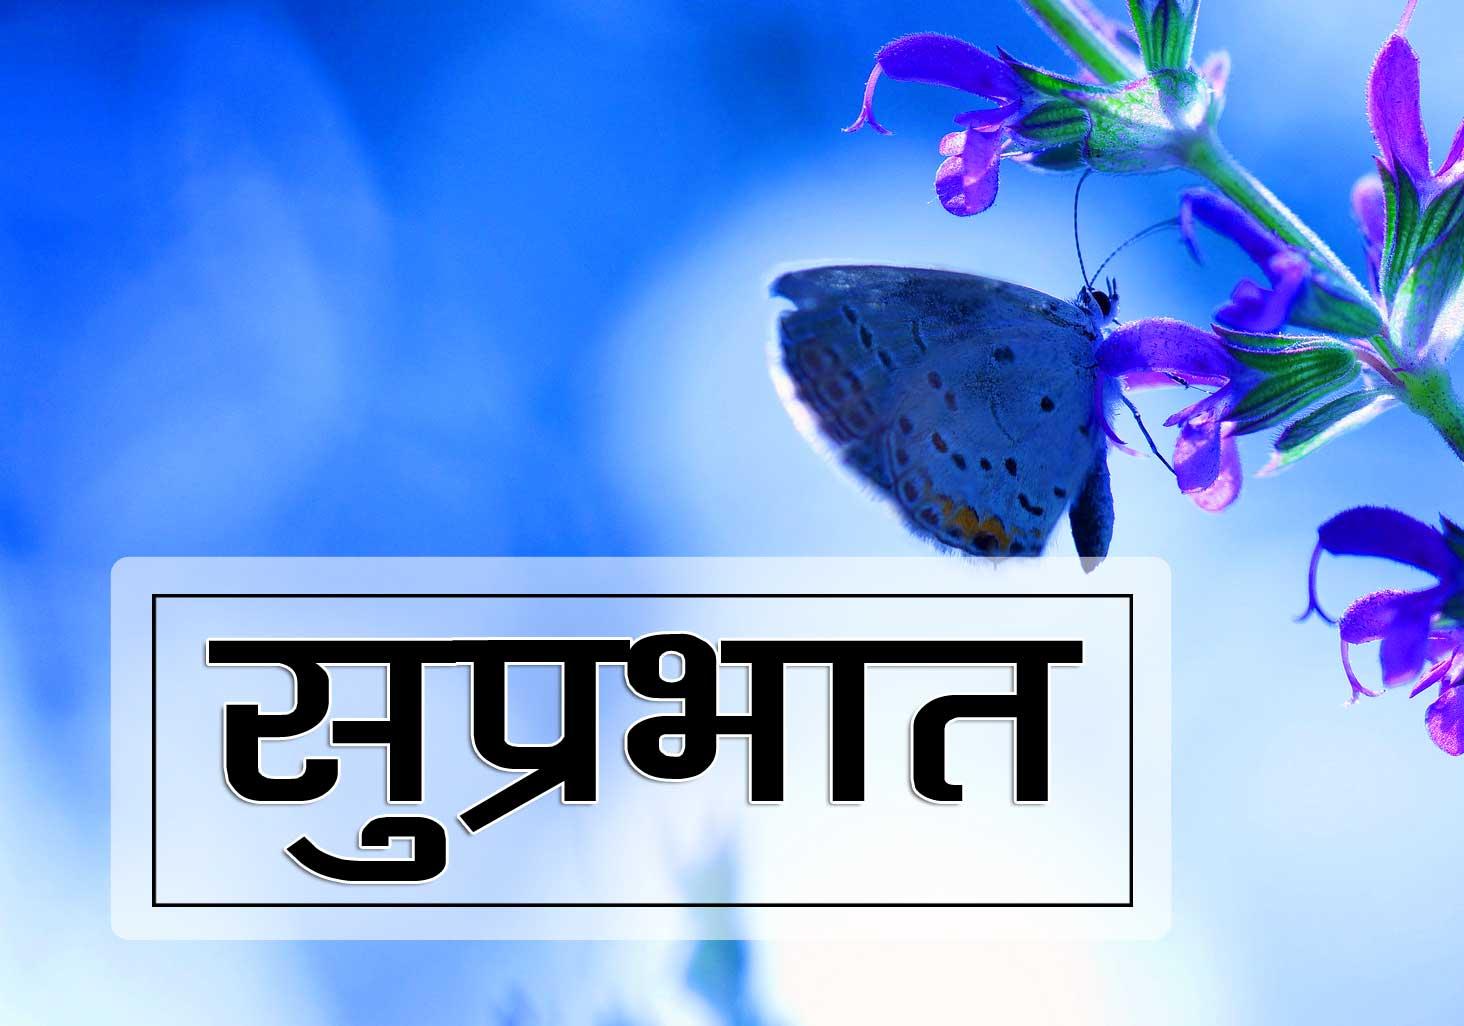 New Suprabhat Pics wallpaper Free